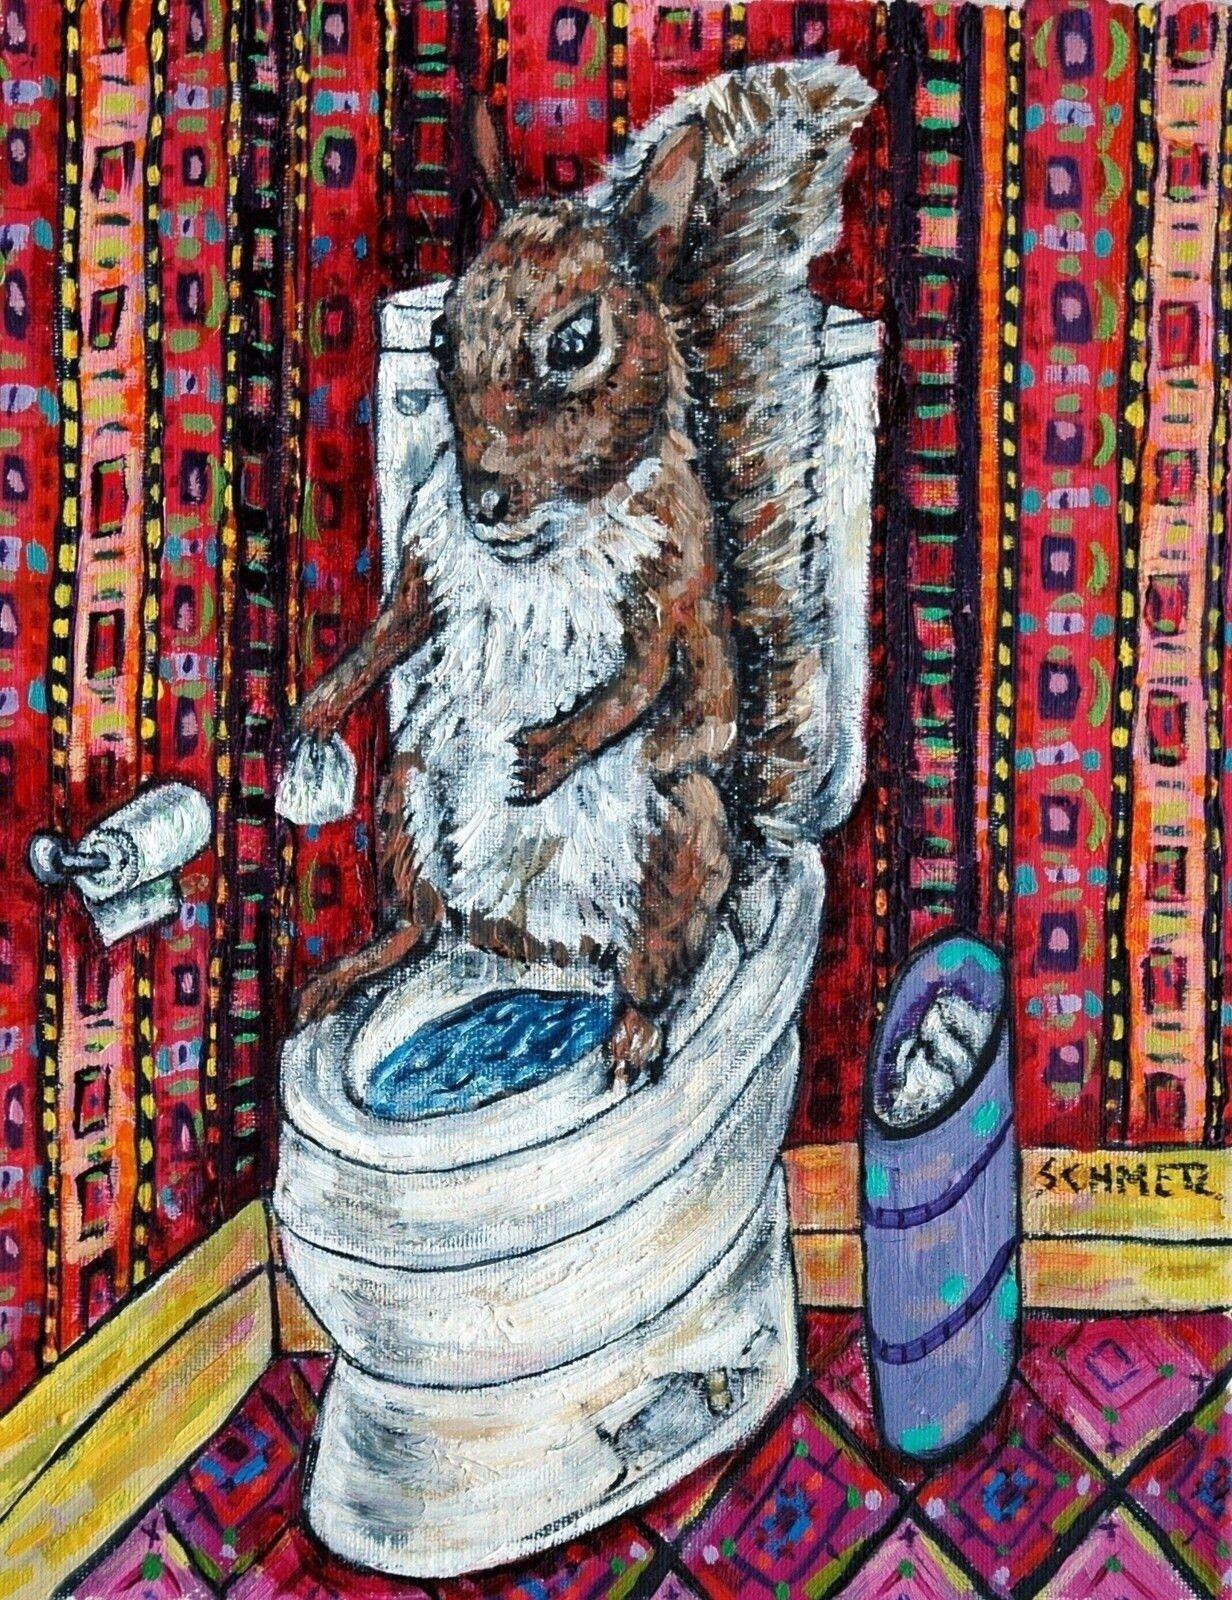 11x14 animal decor print gift squirrel wine wall decor colorful animal art